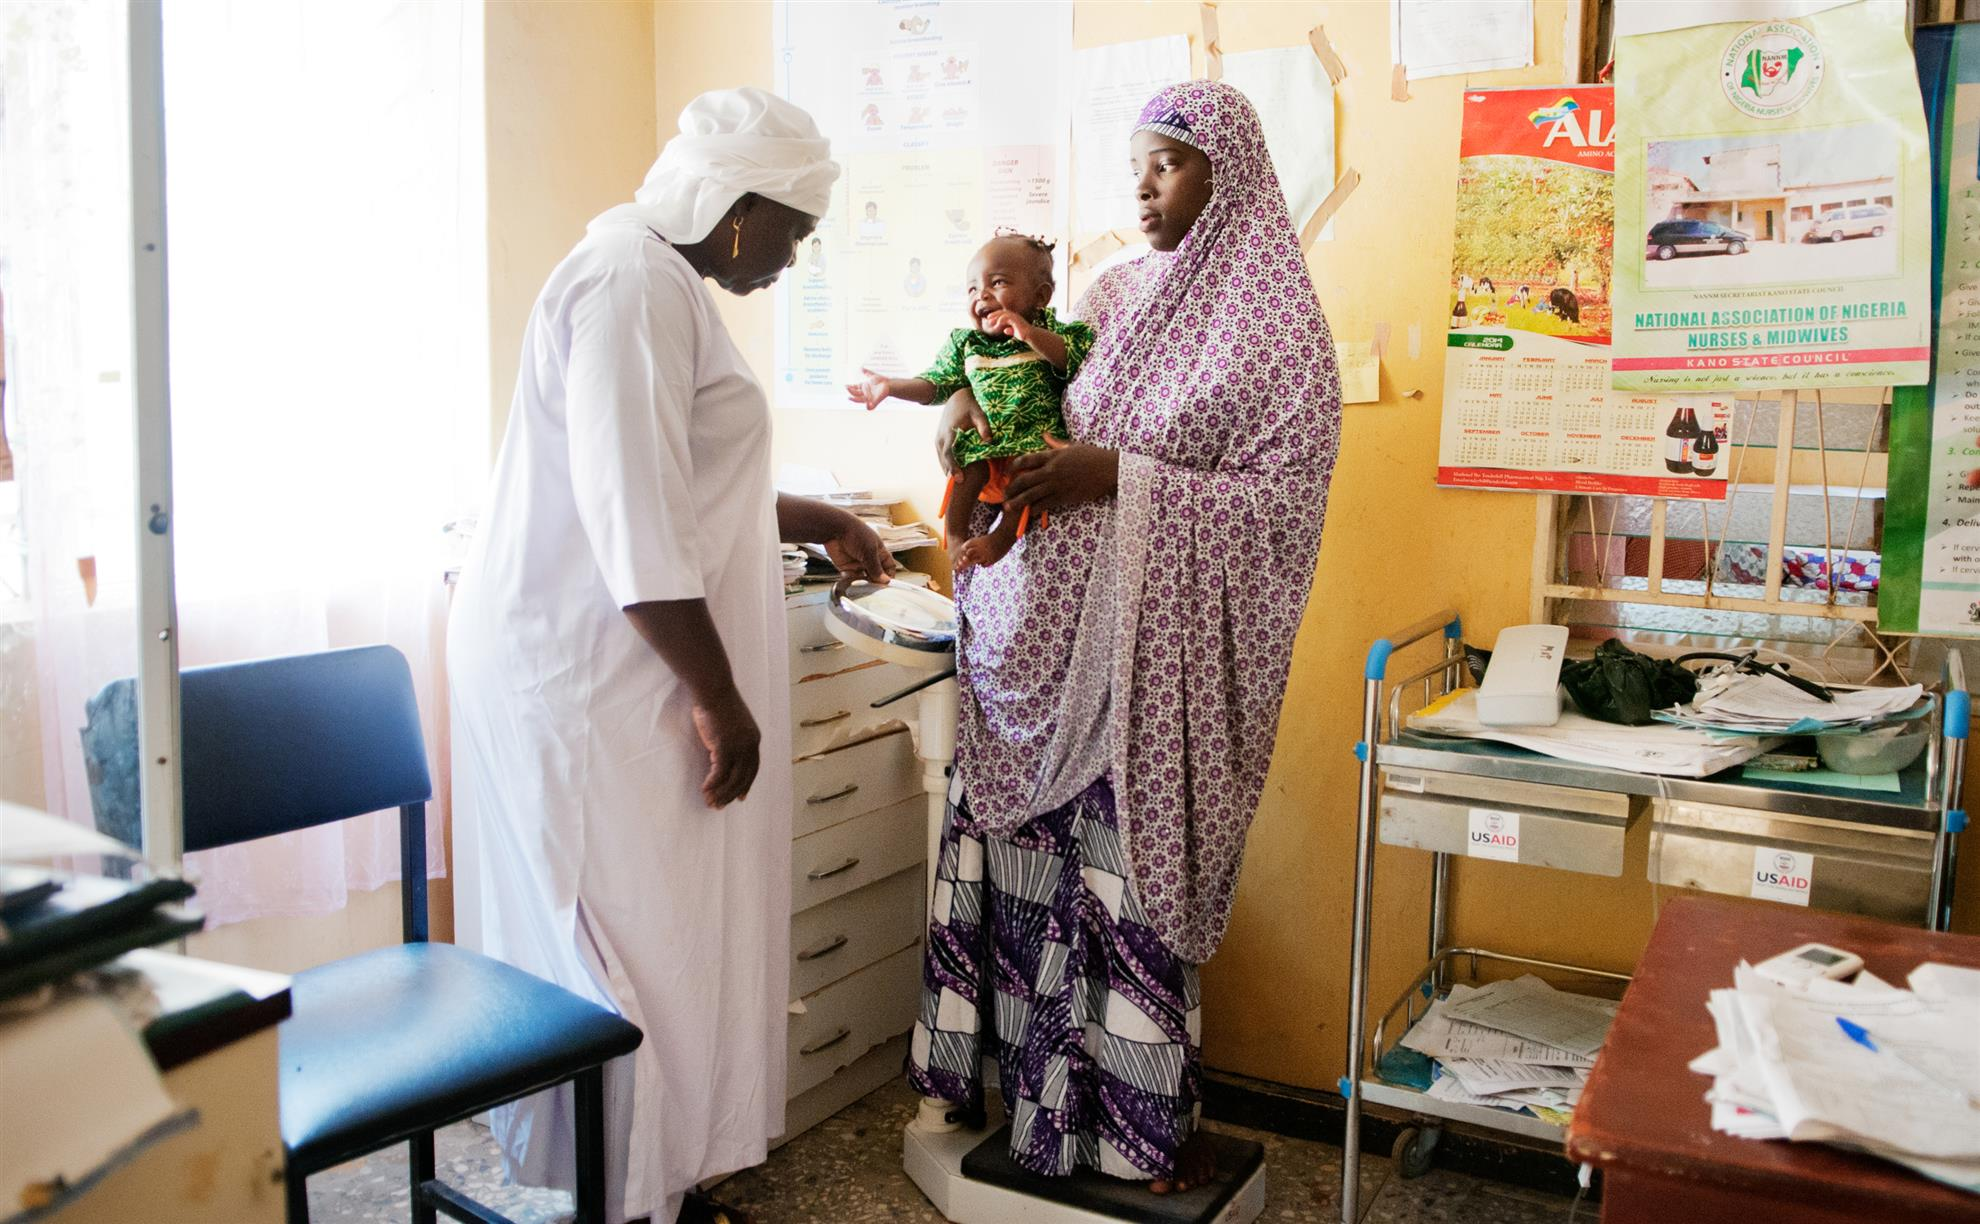 Midwife Tamar Okoh (left) weighs Azima Yahaya and her child Aisha at Sumaila General Hospital in Sumaila, Kano State, Nigeria © Tadej Znidarcic